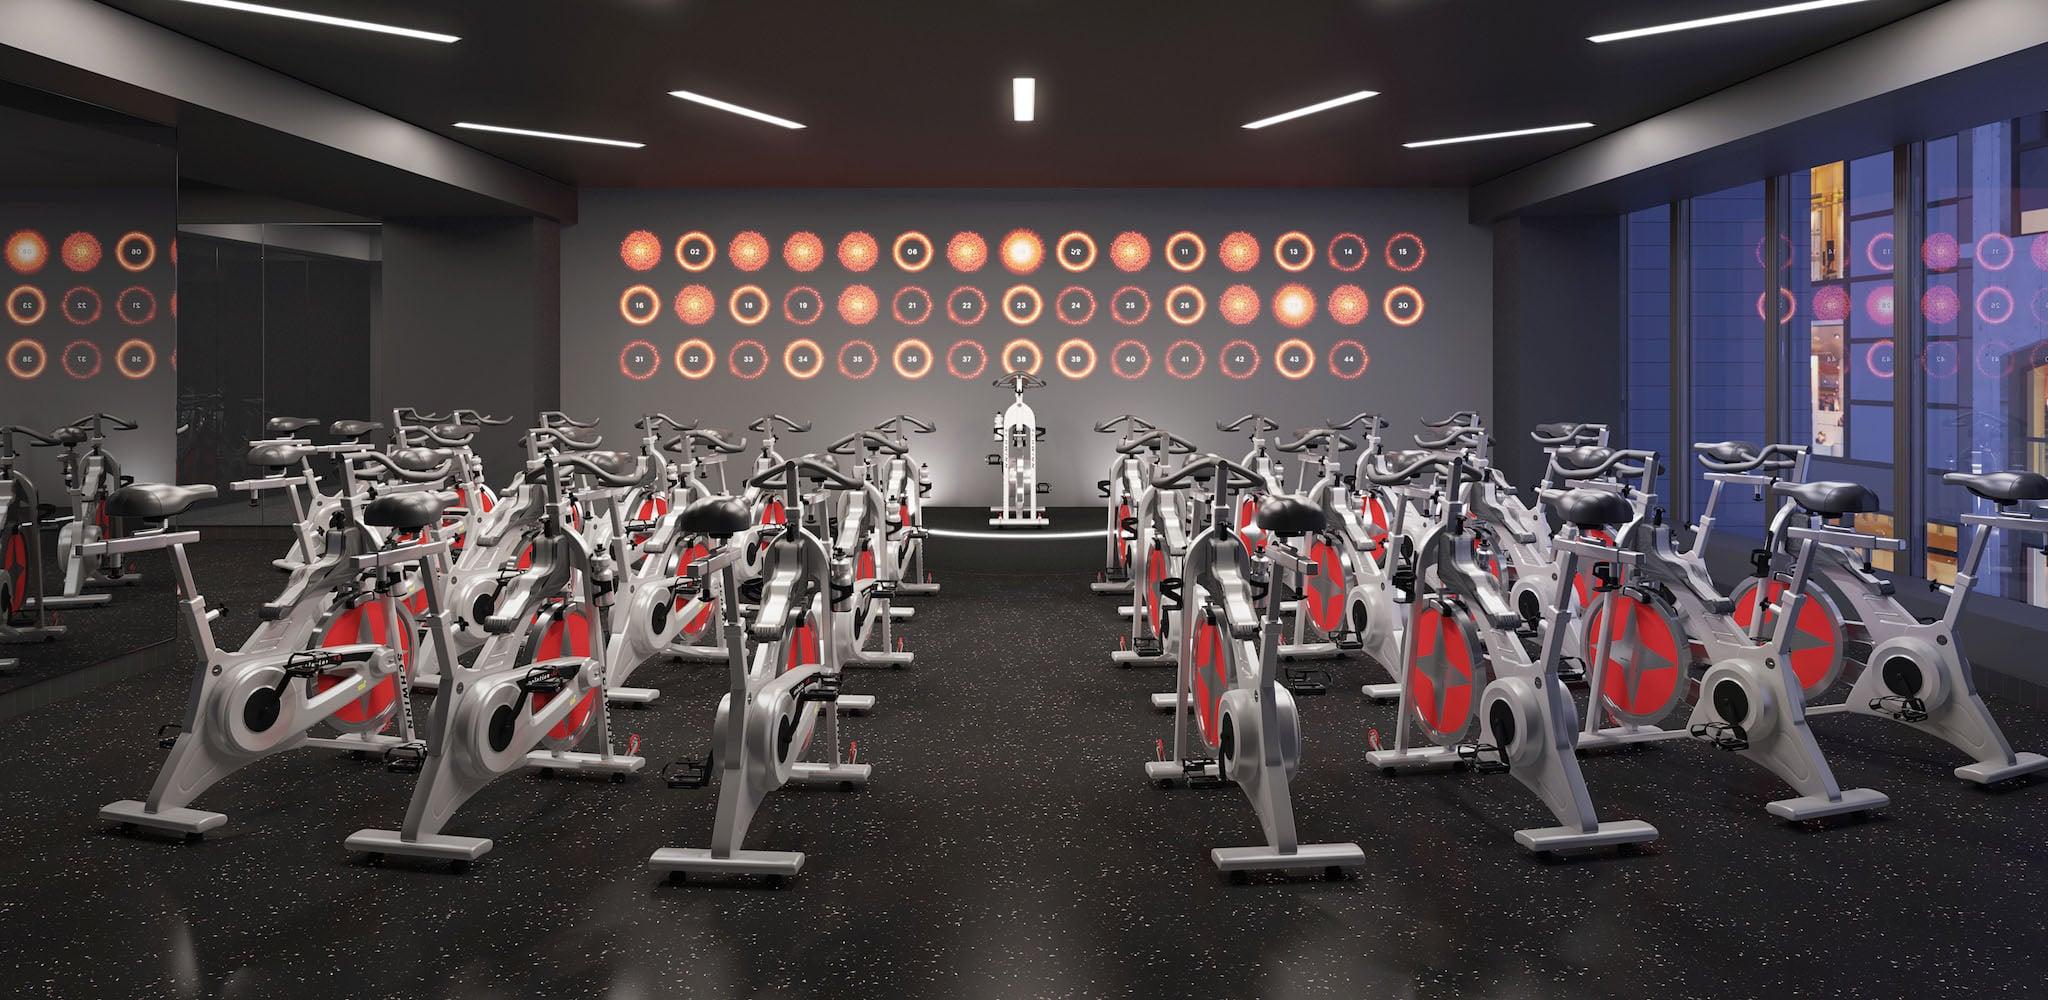 Gym Vs Studio Cycling Classes Popsugar Fitness